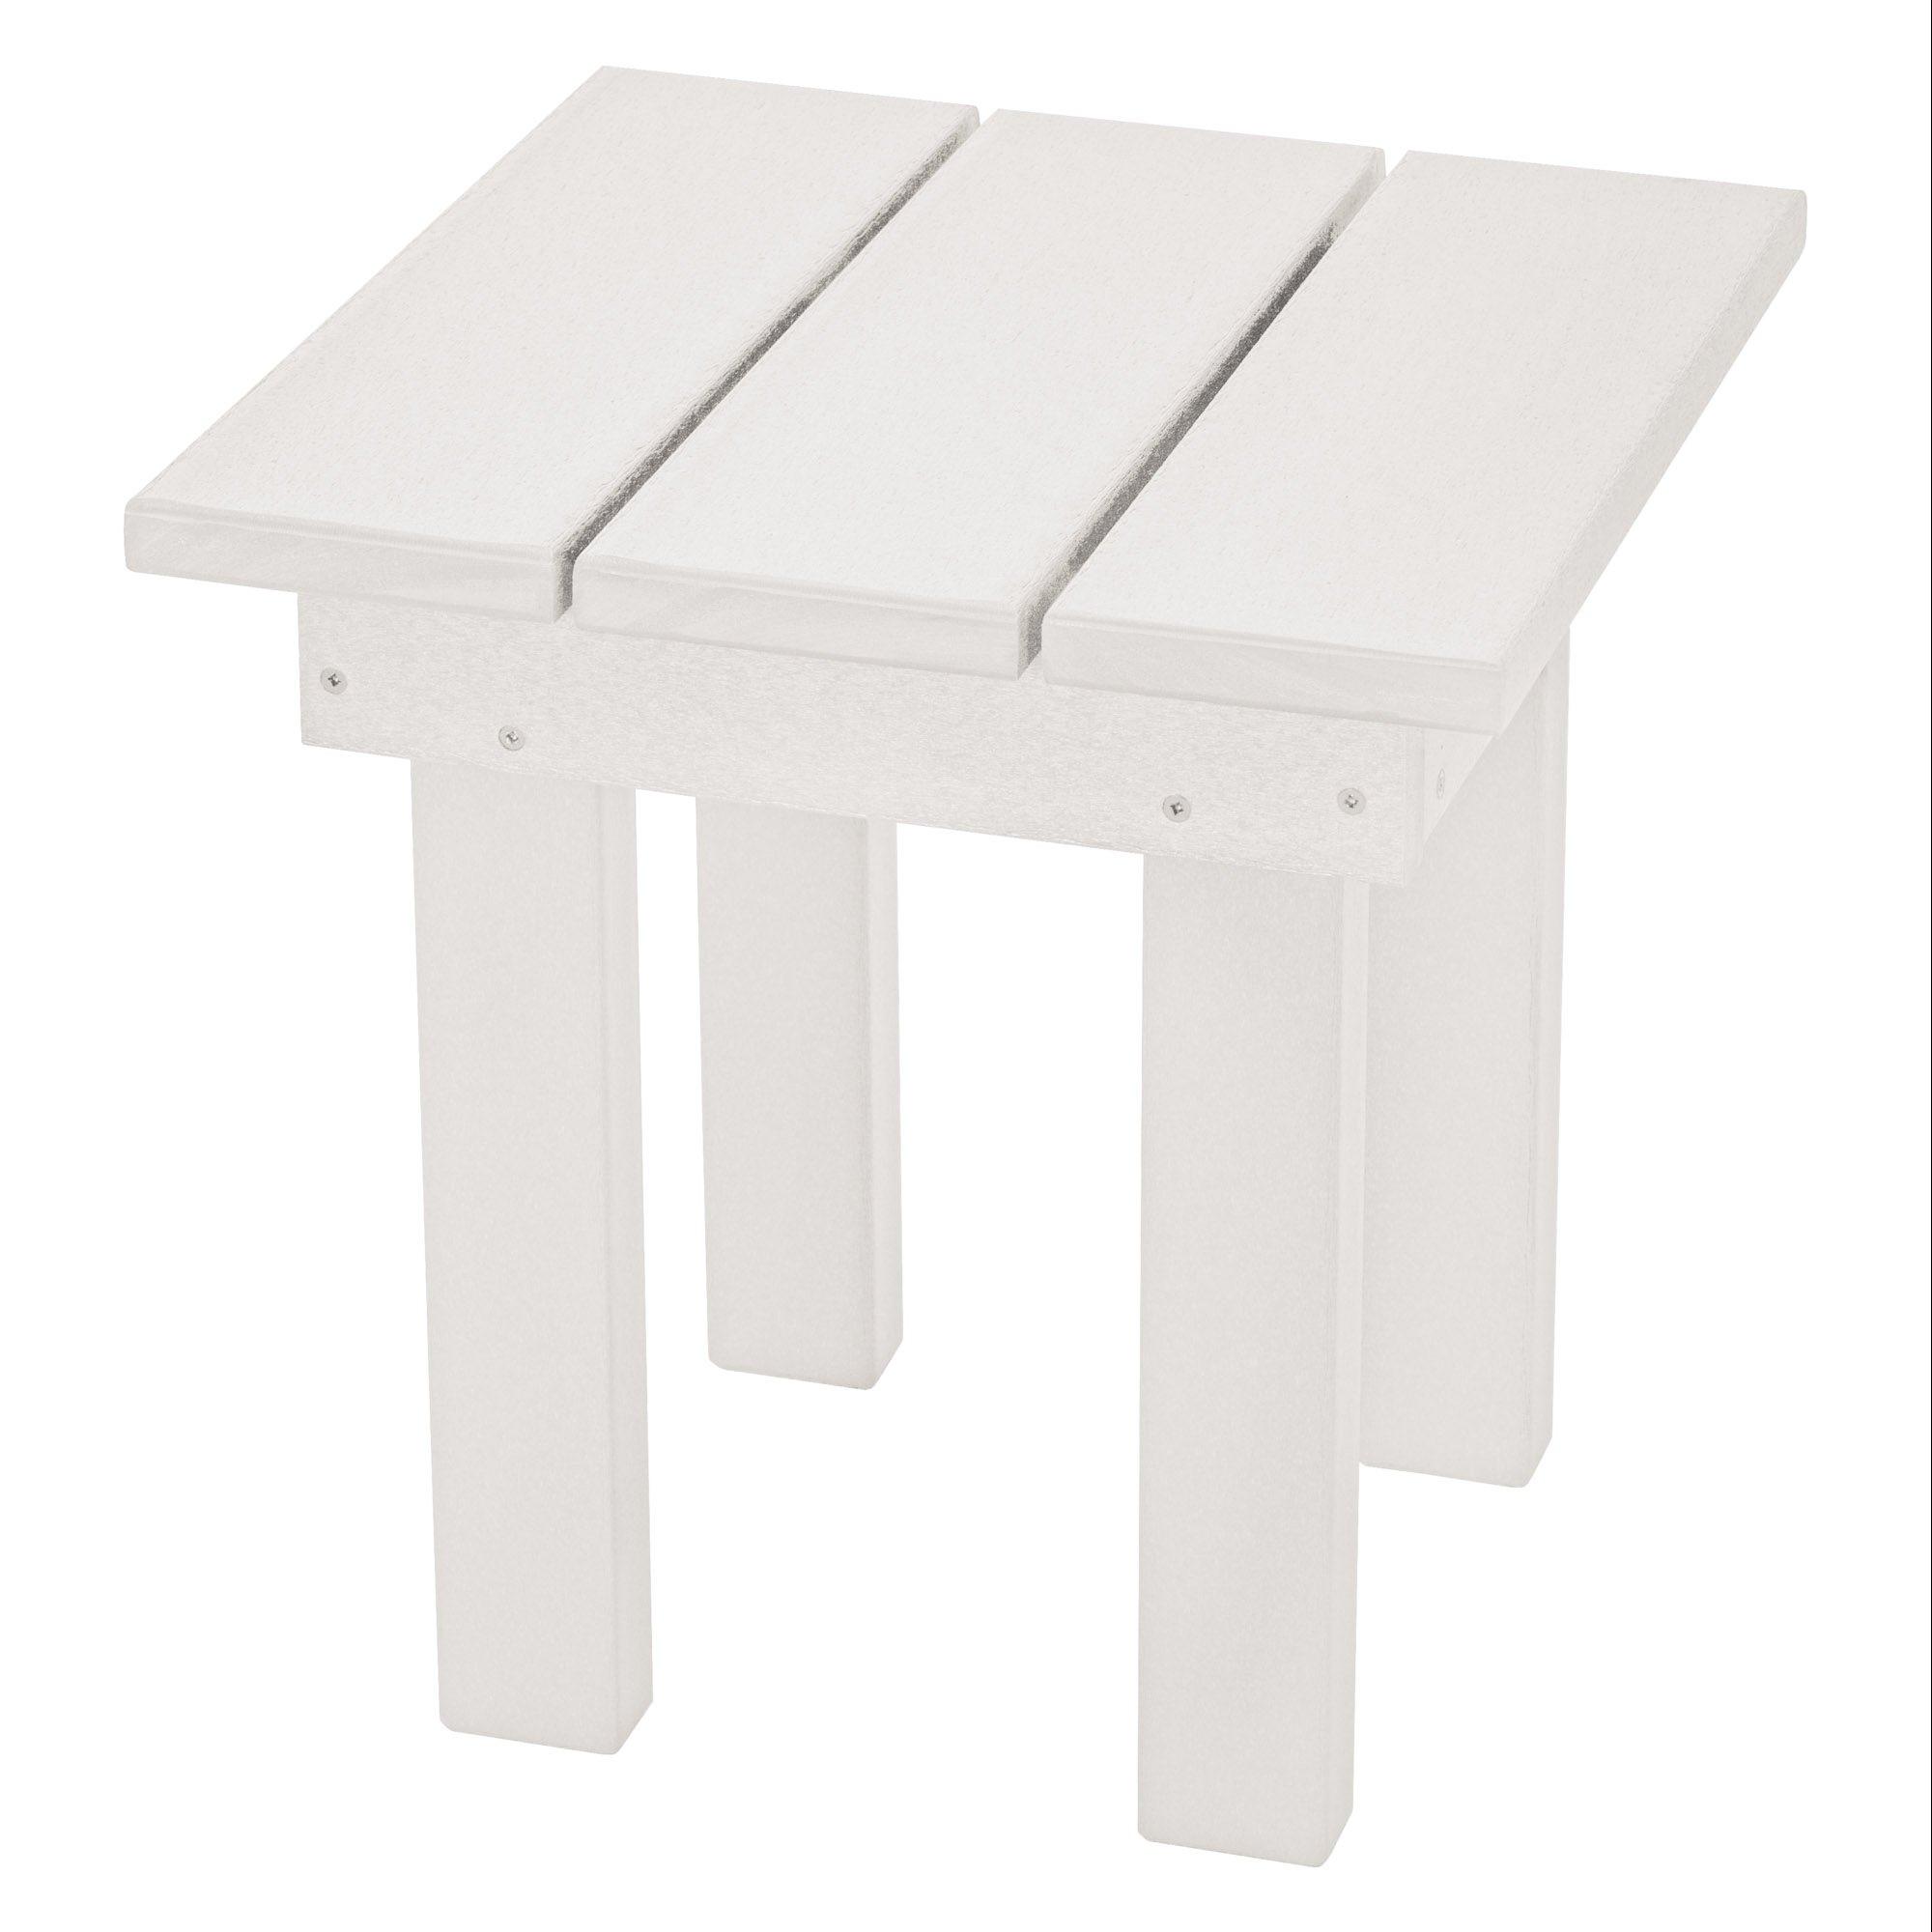 ... Durawood Adirondack Small Side Table ...